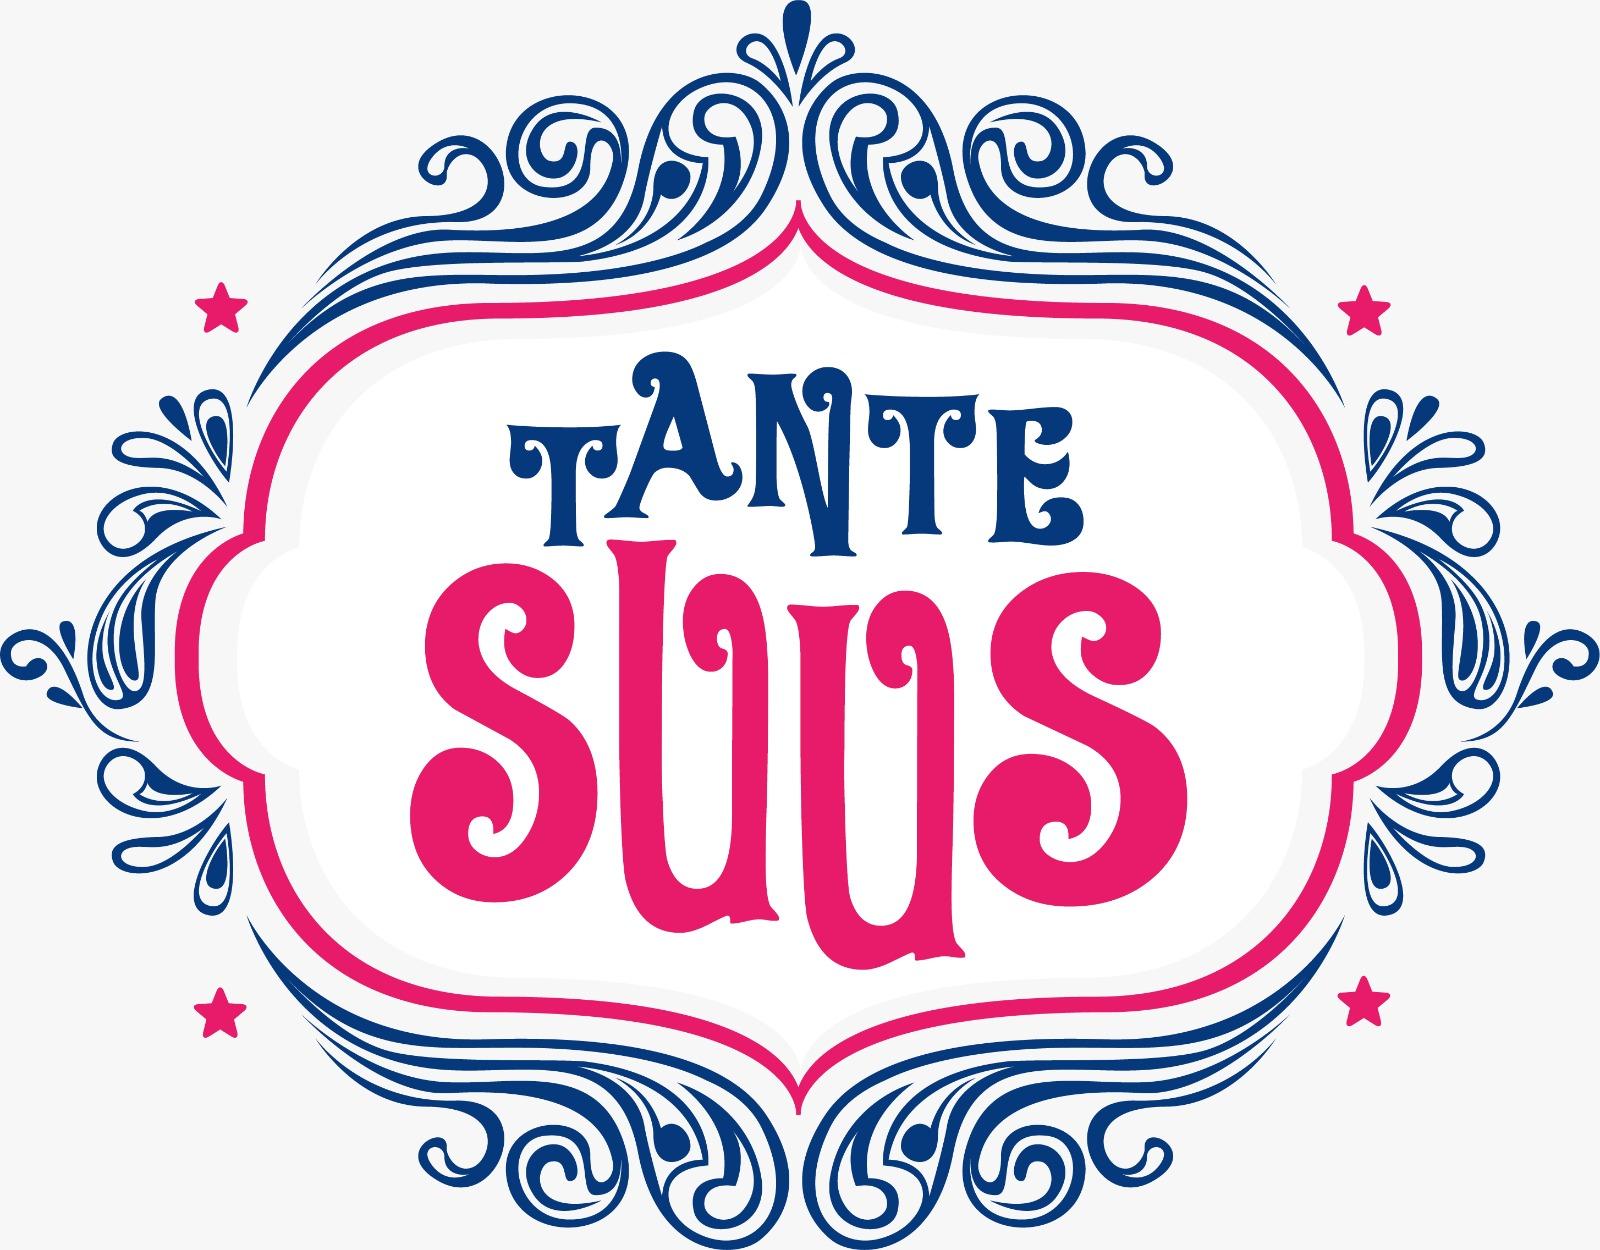 https://tantesuus.com/evenementen/single-suppen/